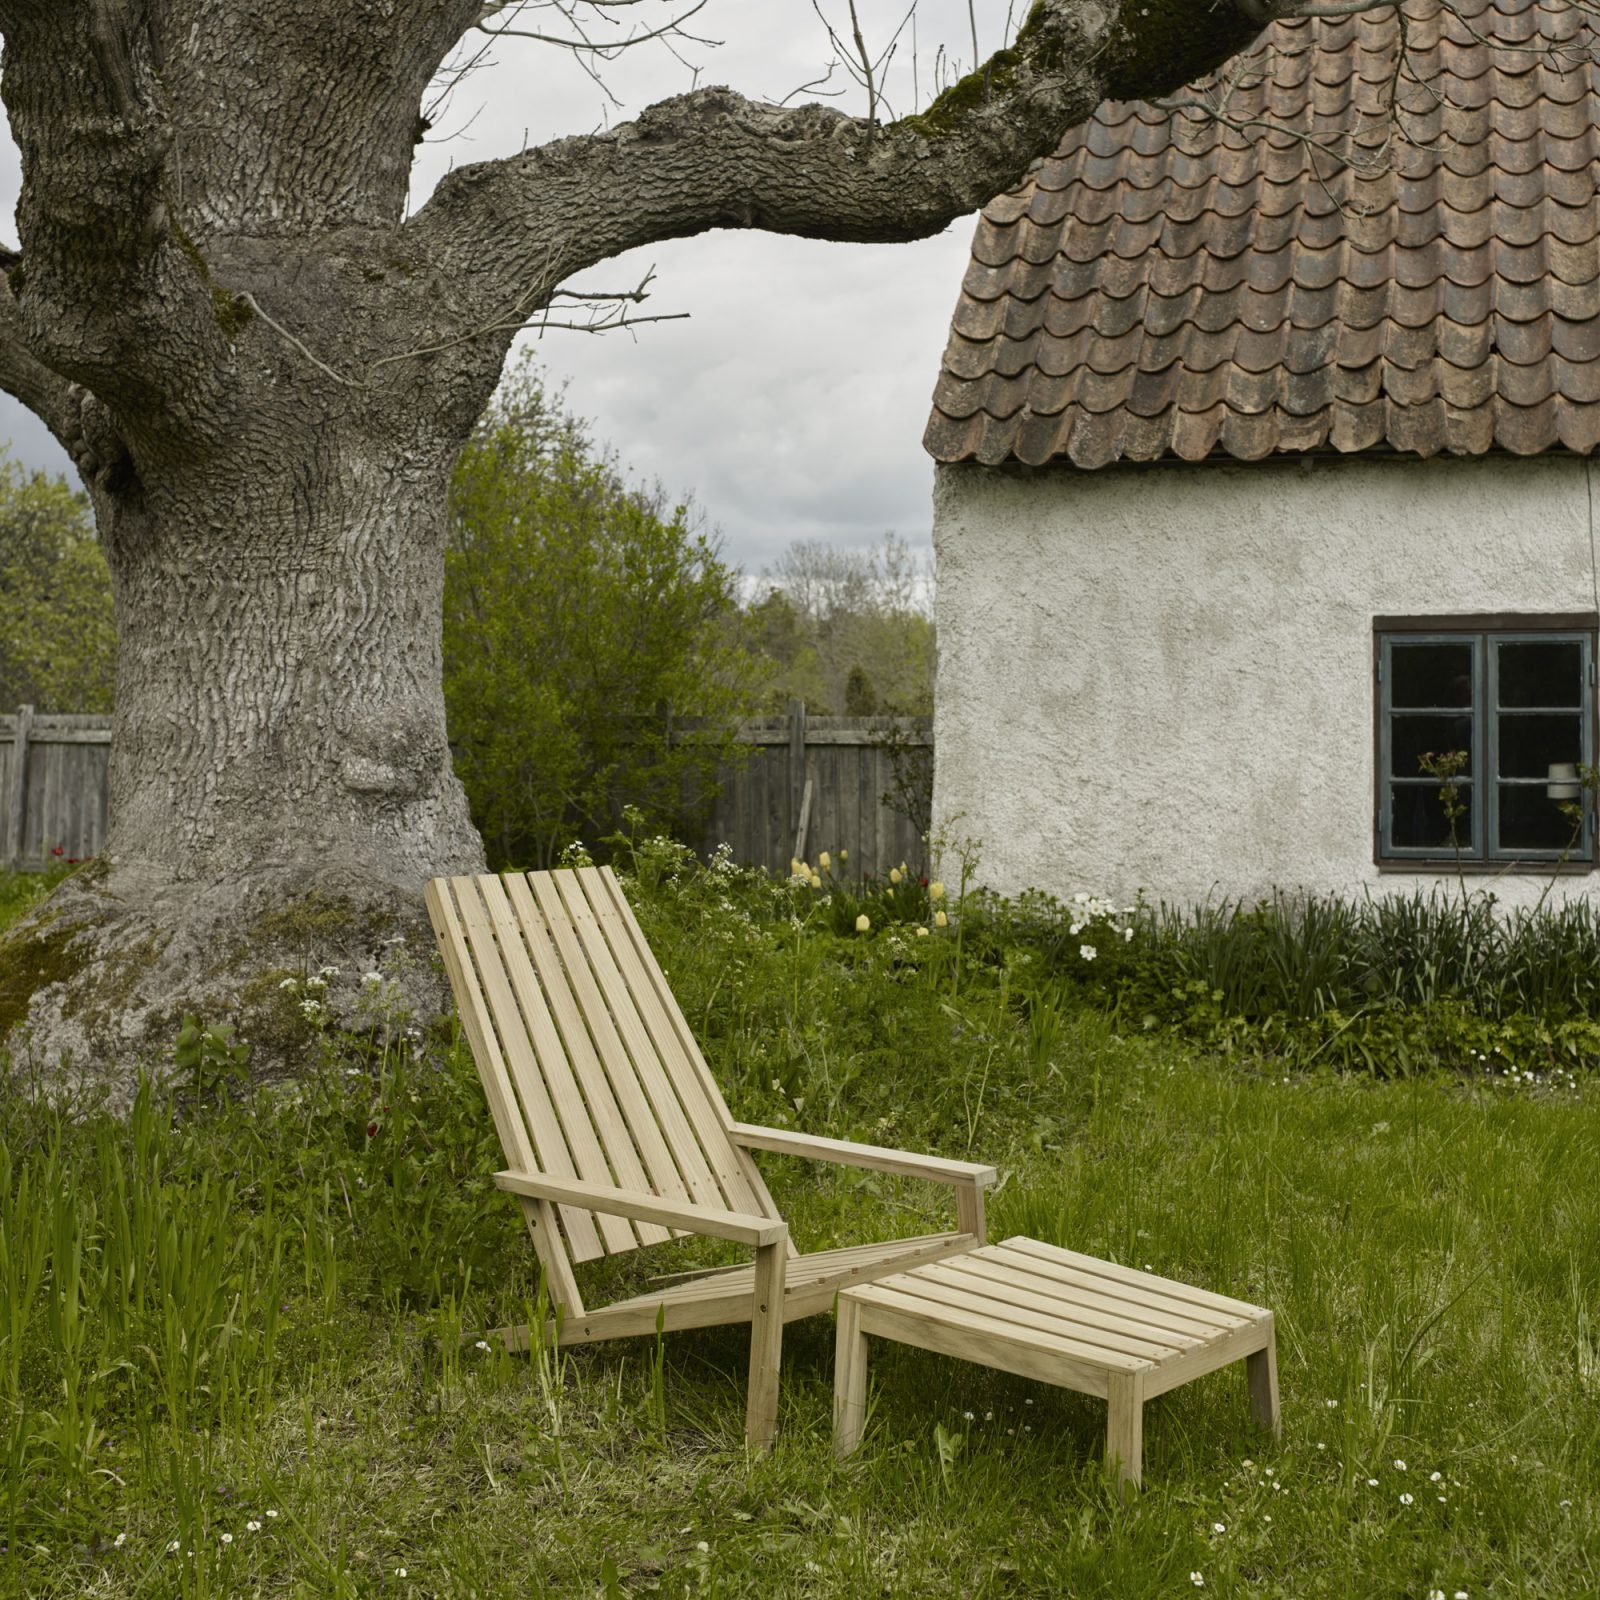 hardwood-garden-chairs-4